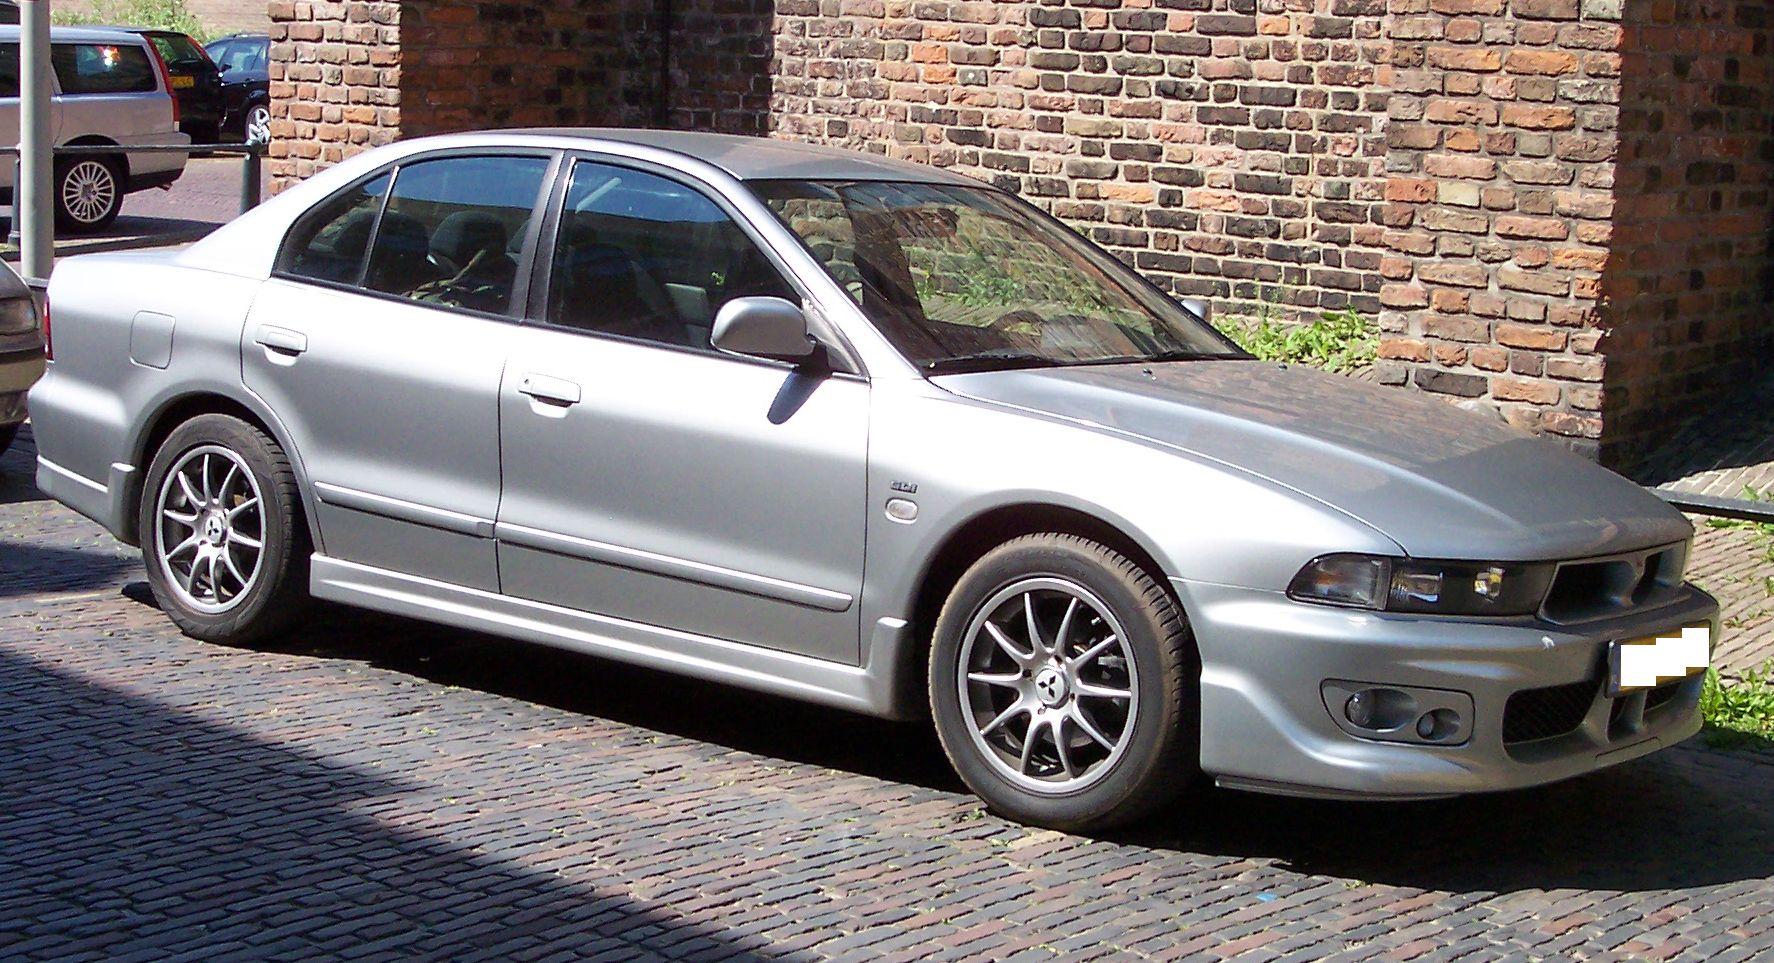 Mitsubishi galant full model change 2013